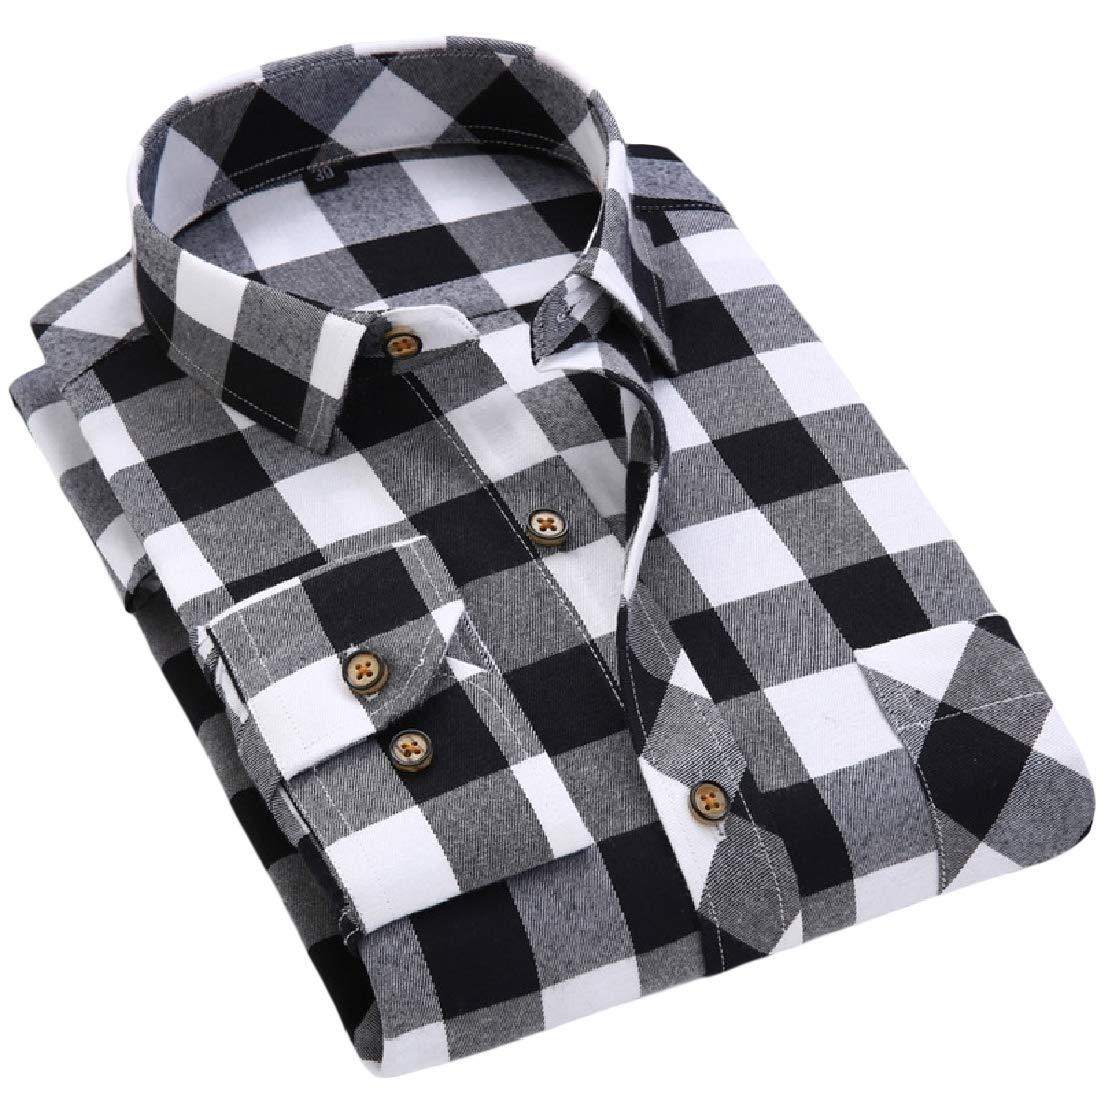 Wofupowga Mens Long-Sleeve Plaid Button-Down Lapel Collar Shirts